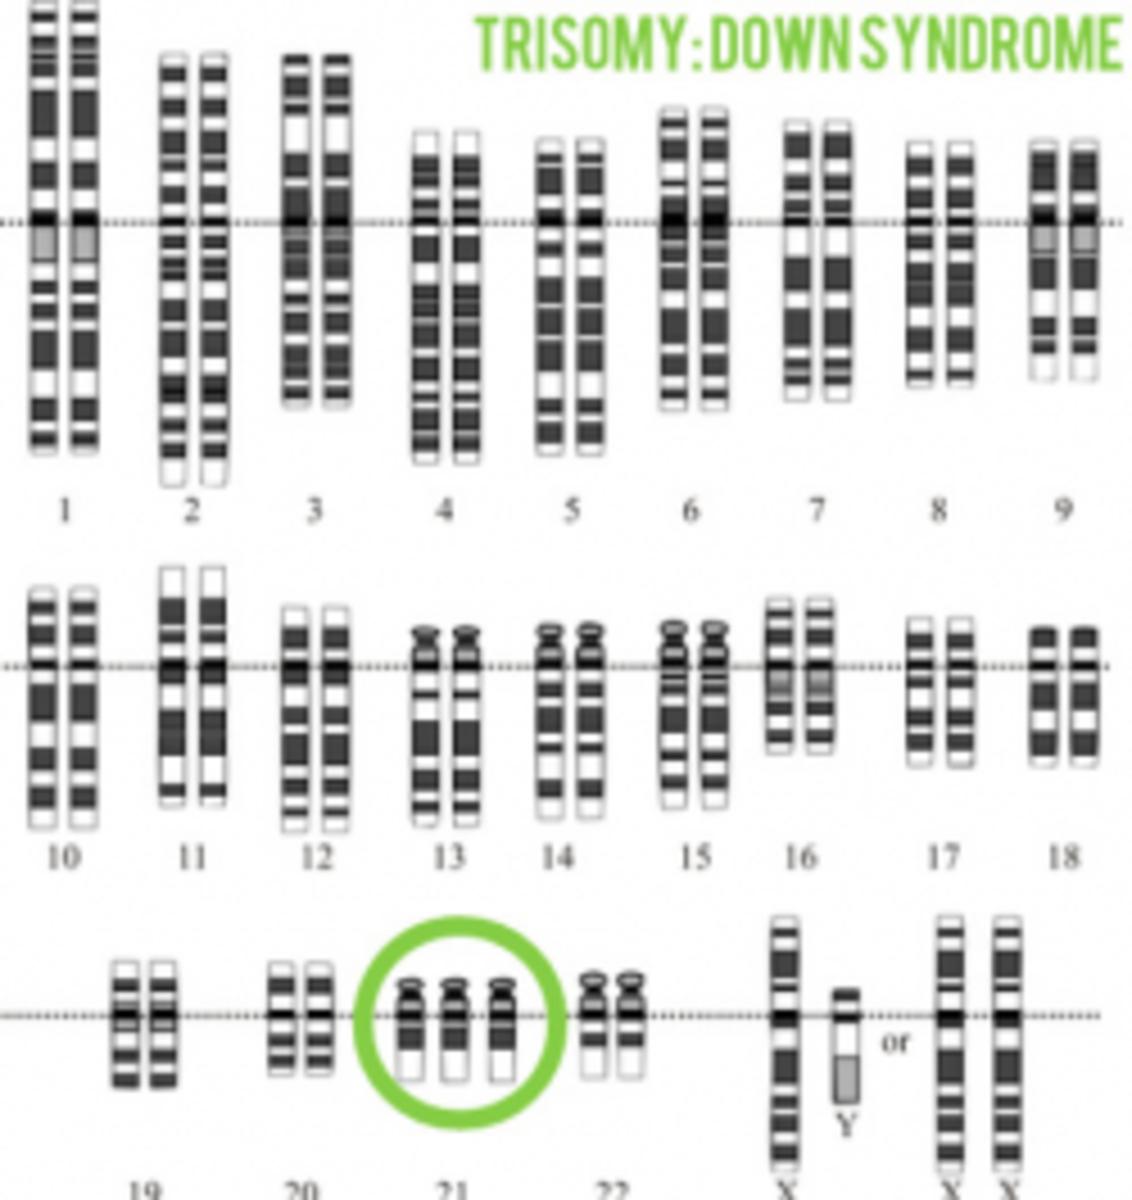 Karyotype Illustrating Trisomy of the 21st Chromosome